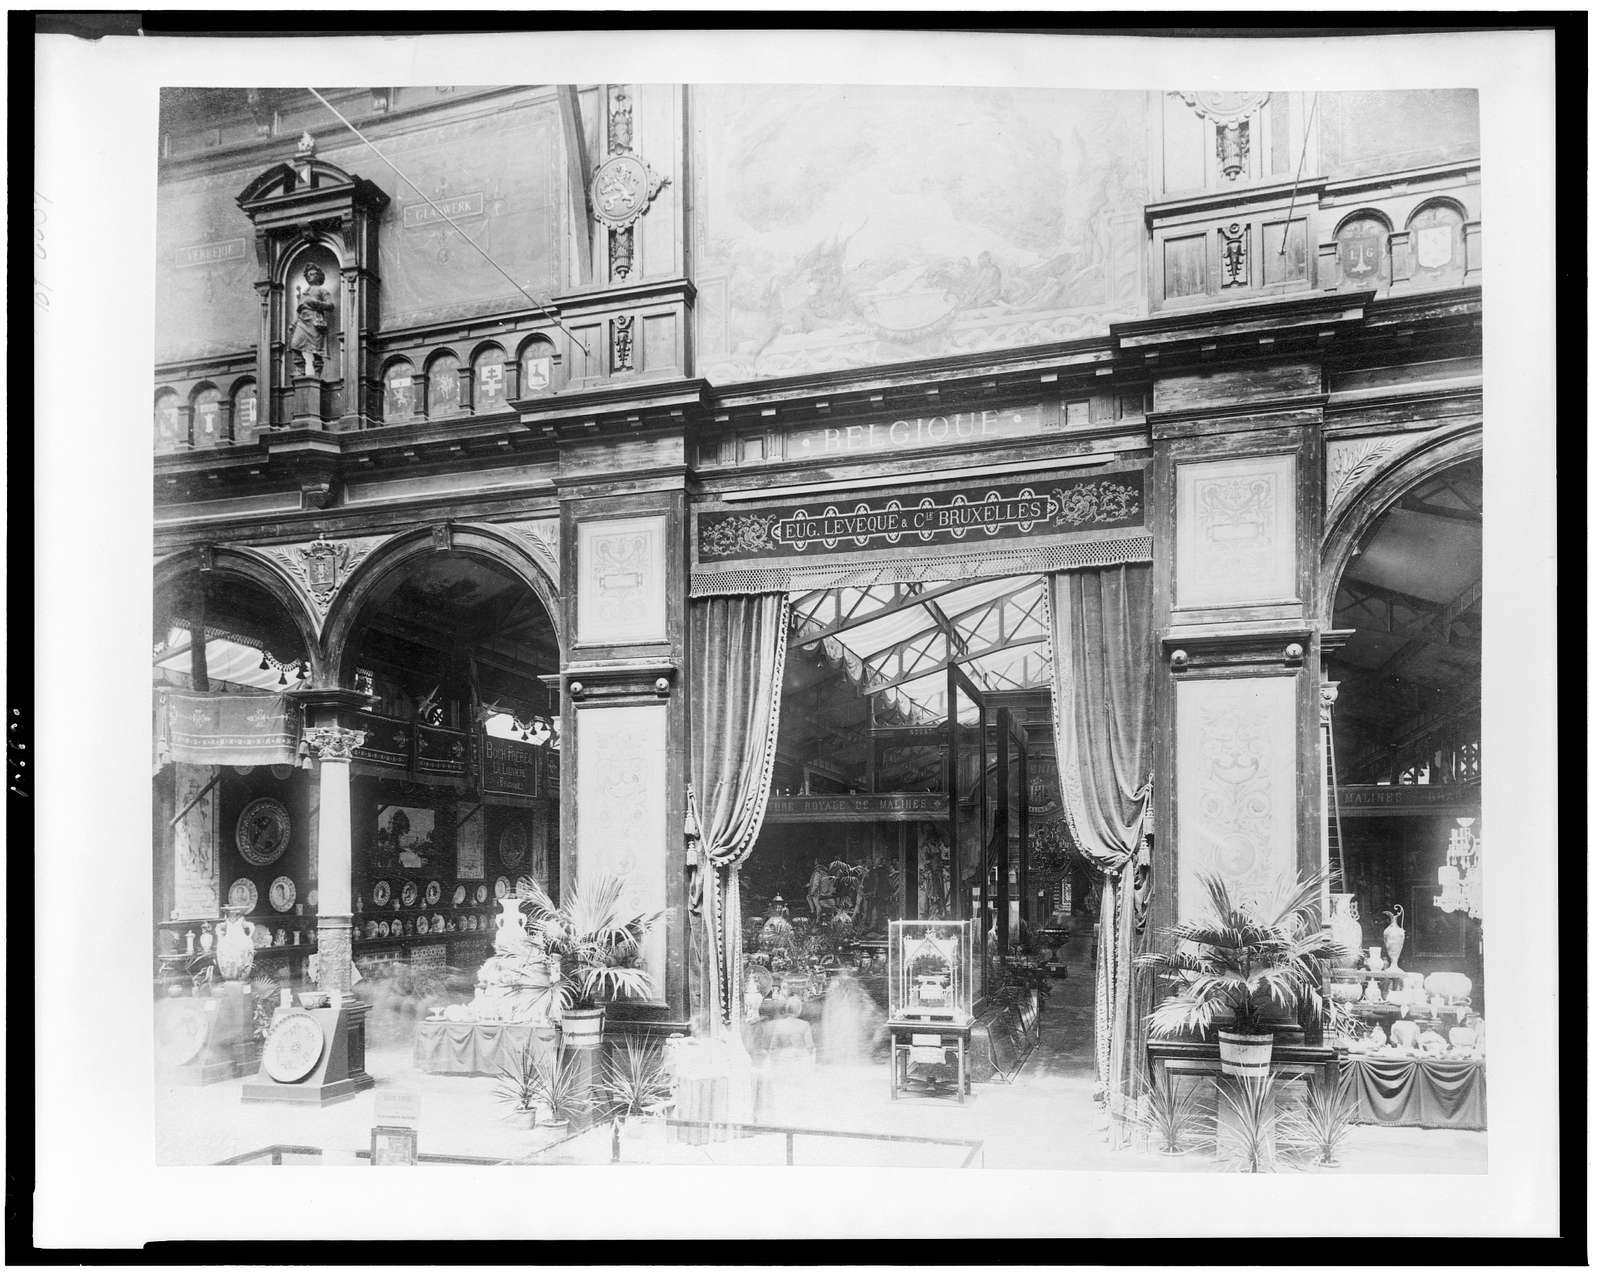 [Entrance to the Belgian exhibit, Palace of Diverse Industries, Paris Exposition, 1889]